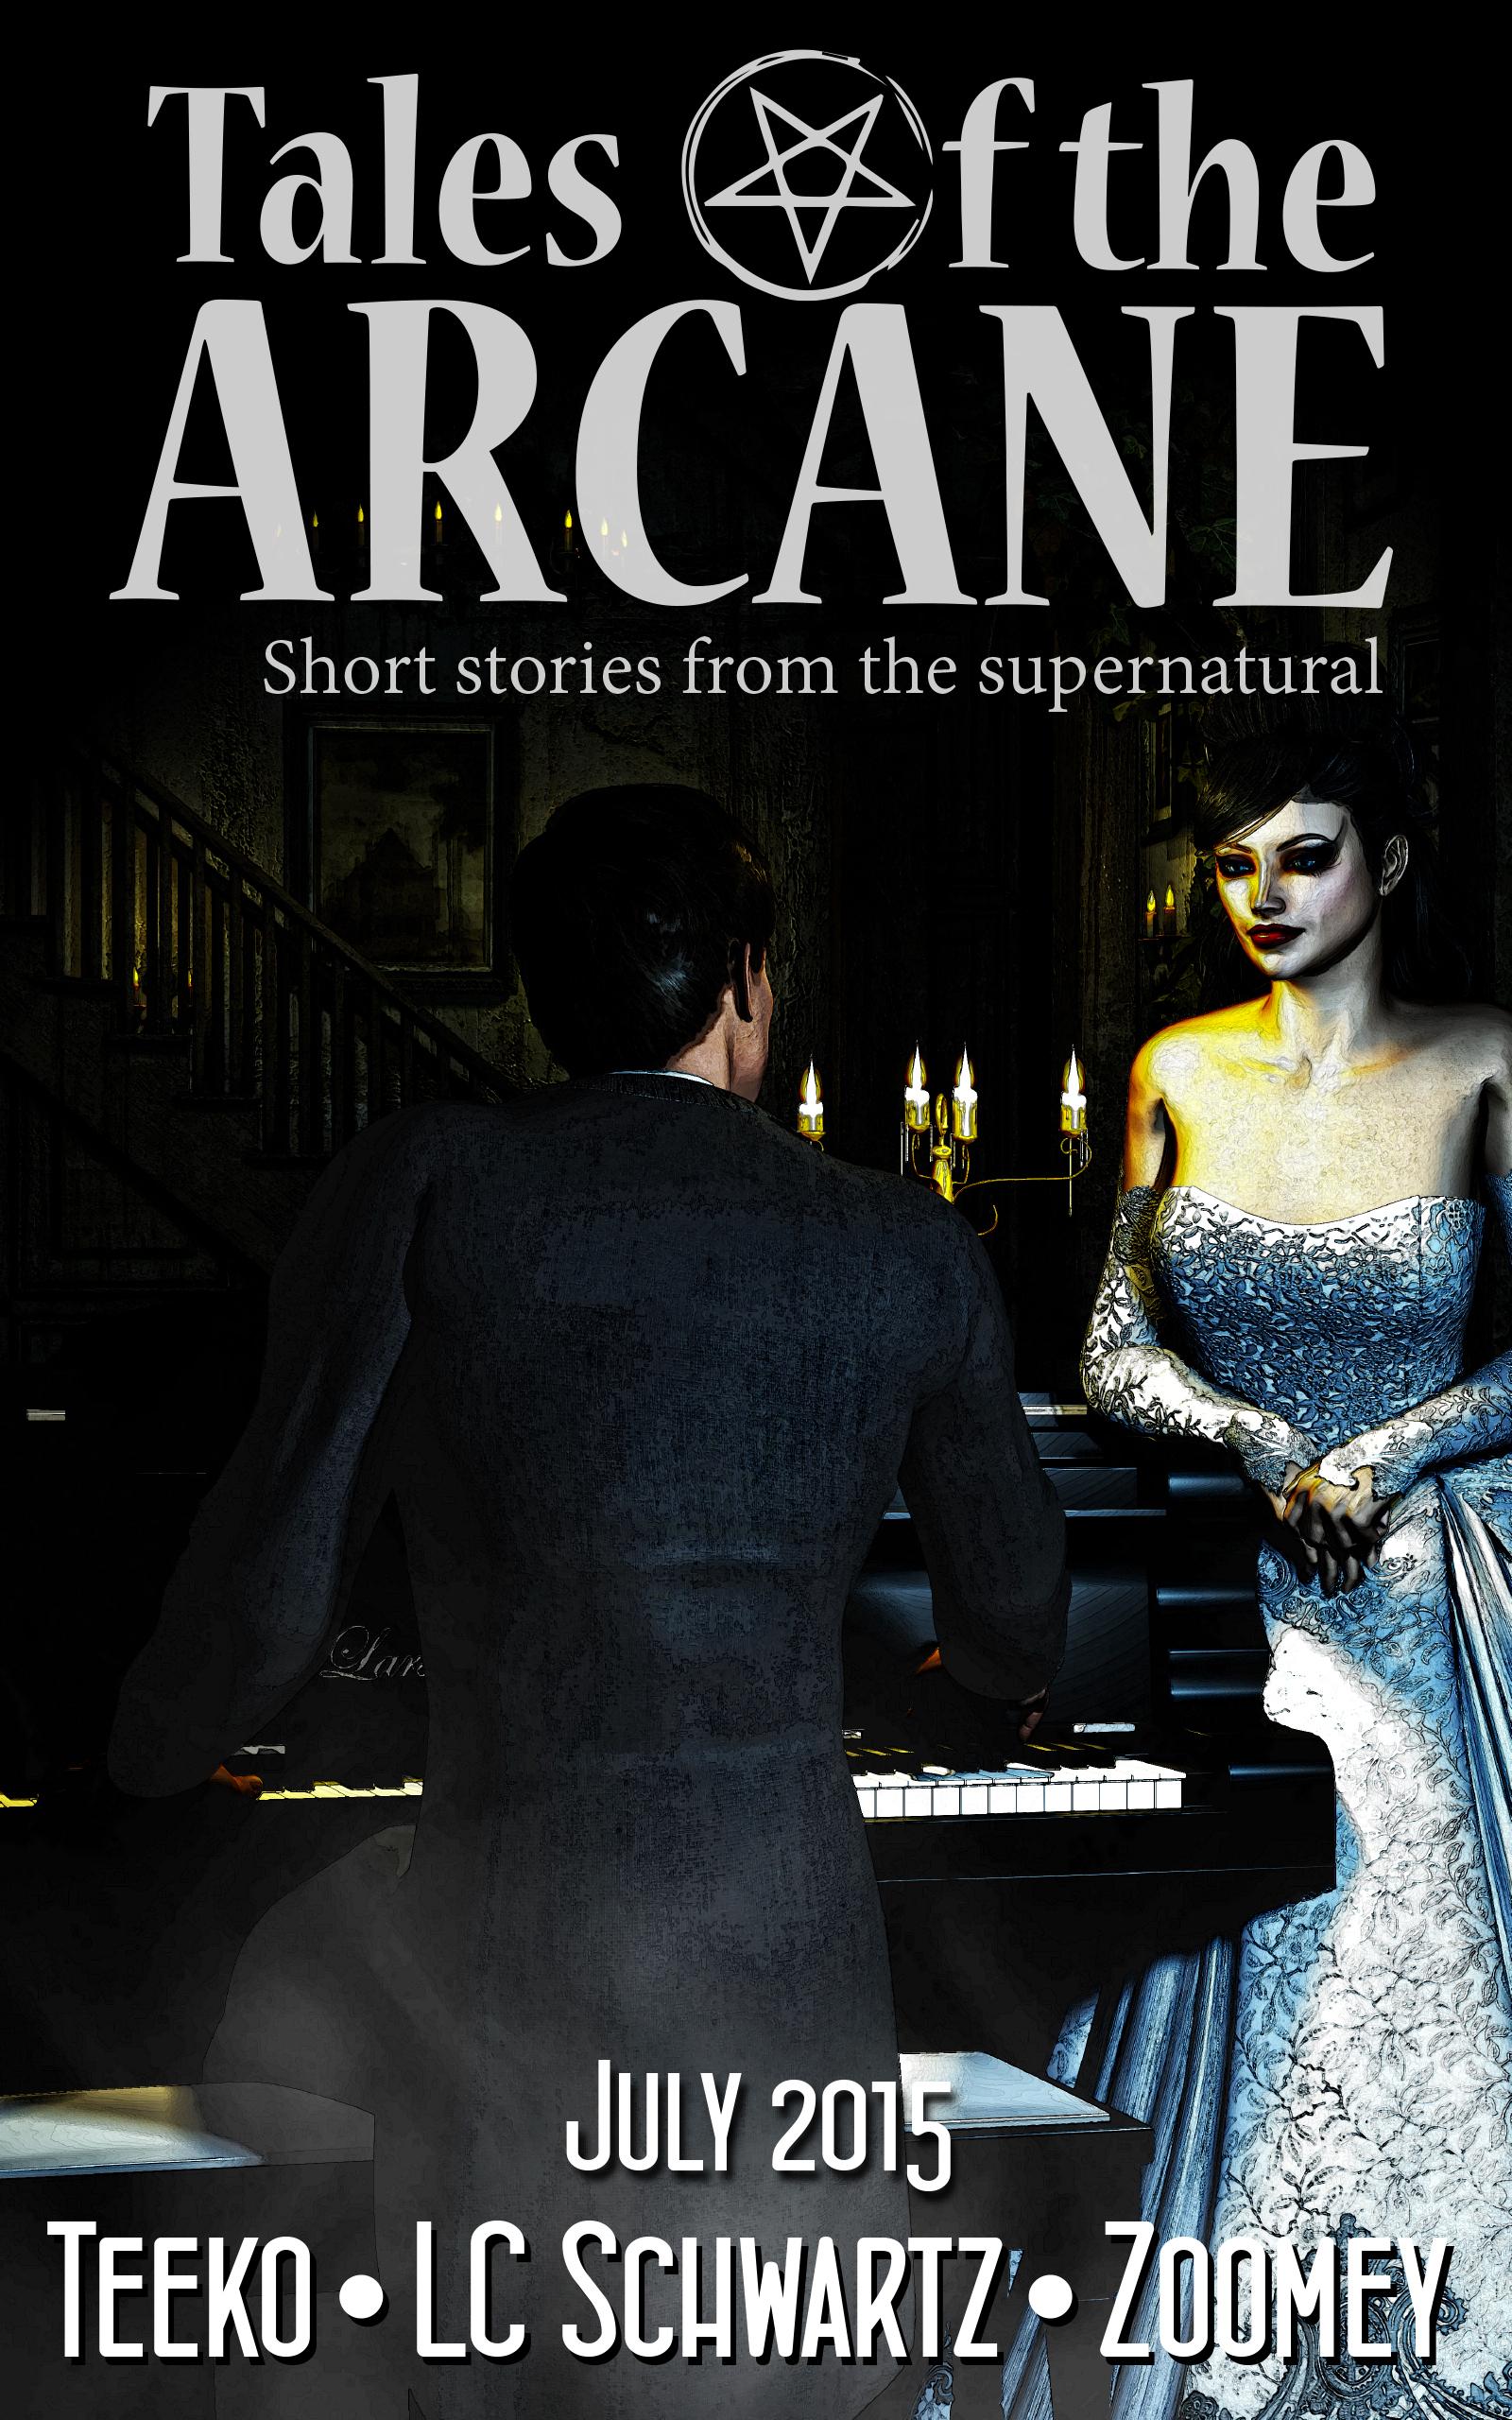 Tales of the Arcane: 0715 LC Schwartz